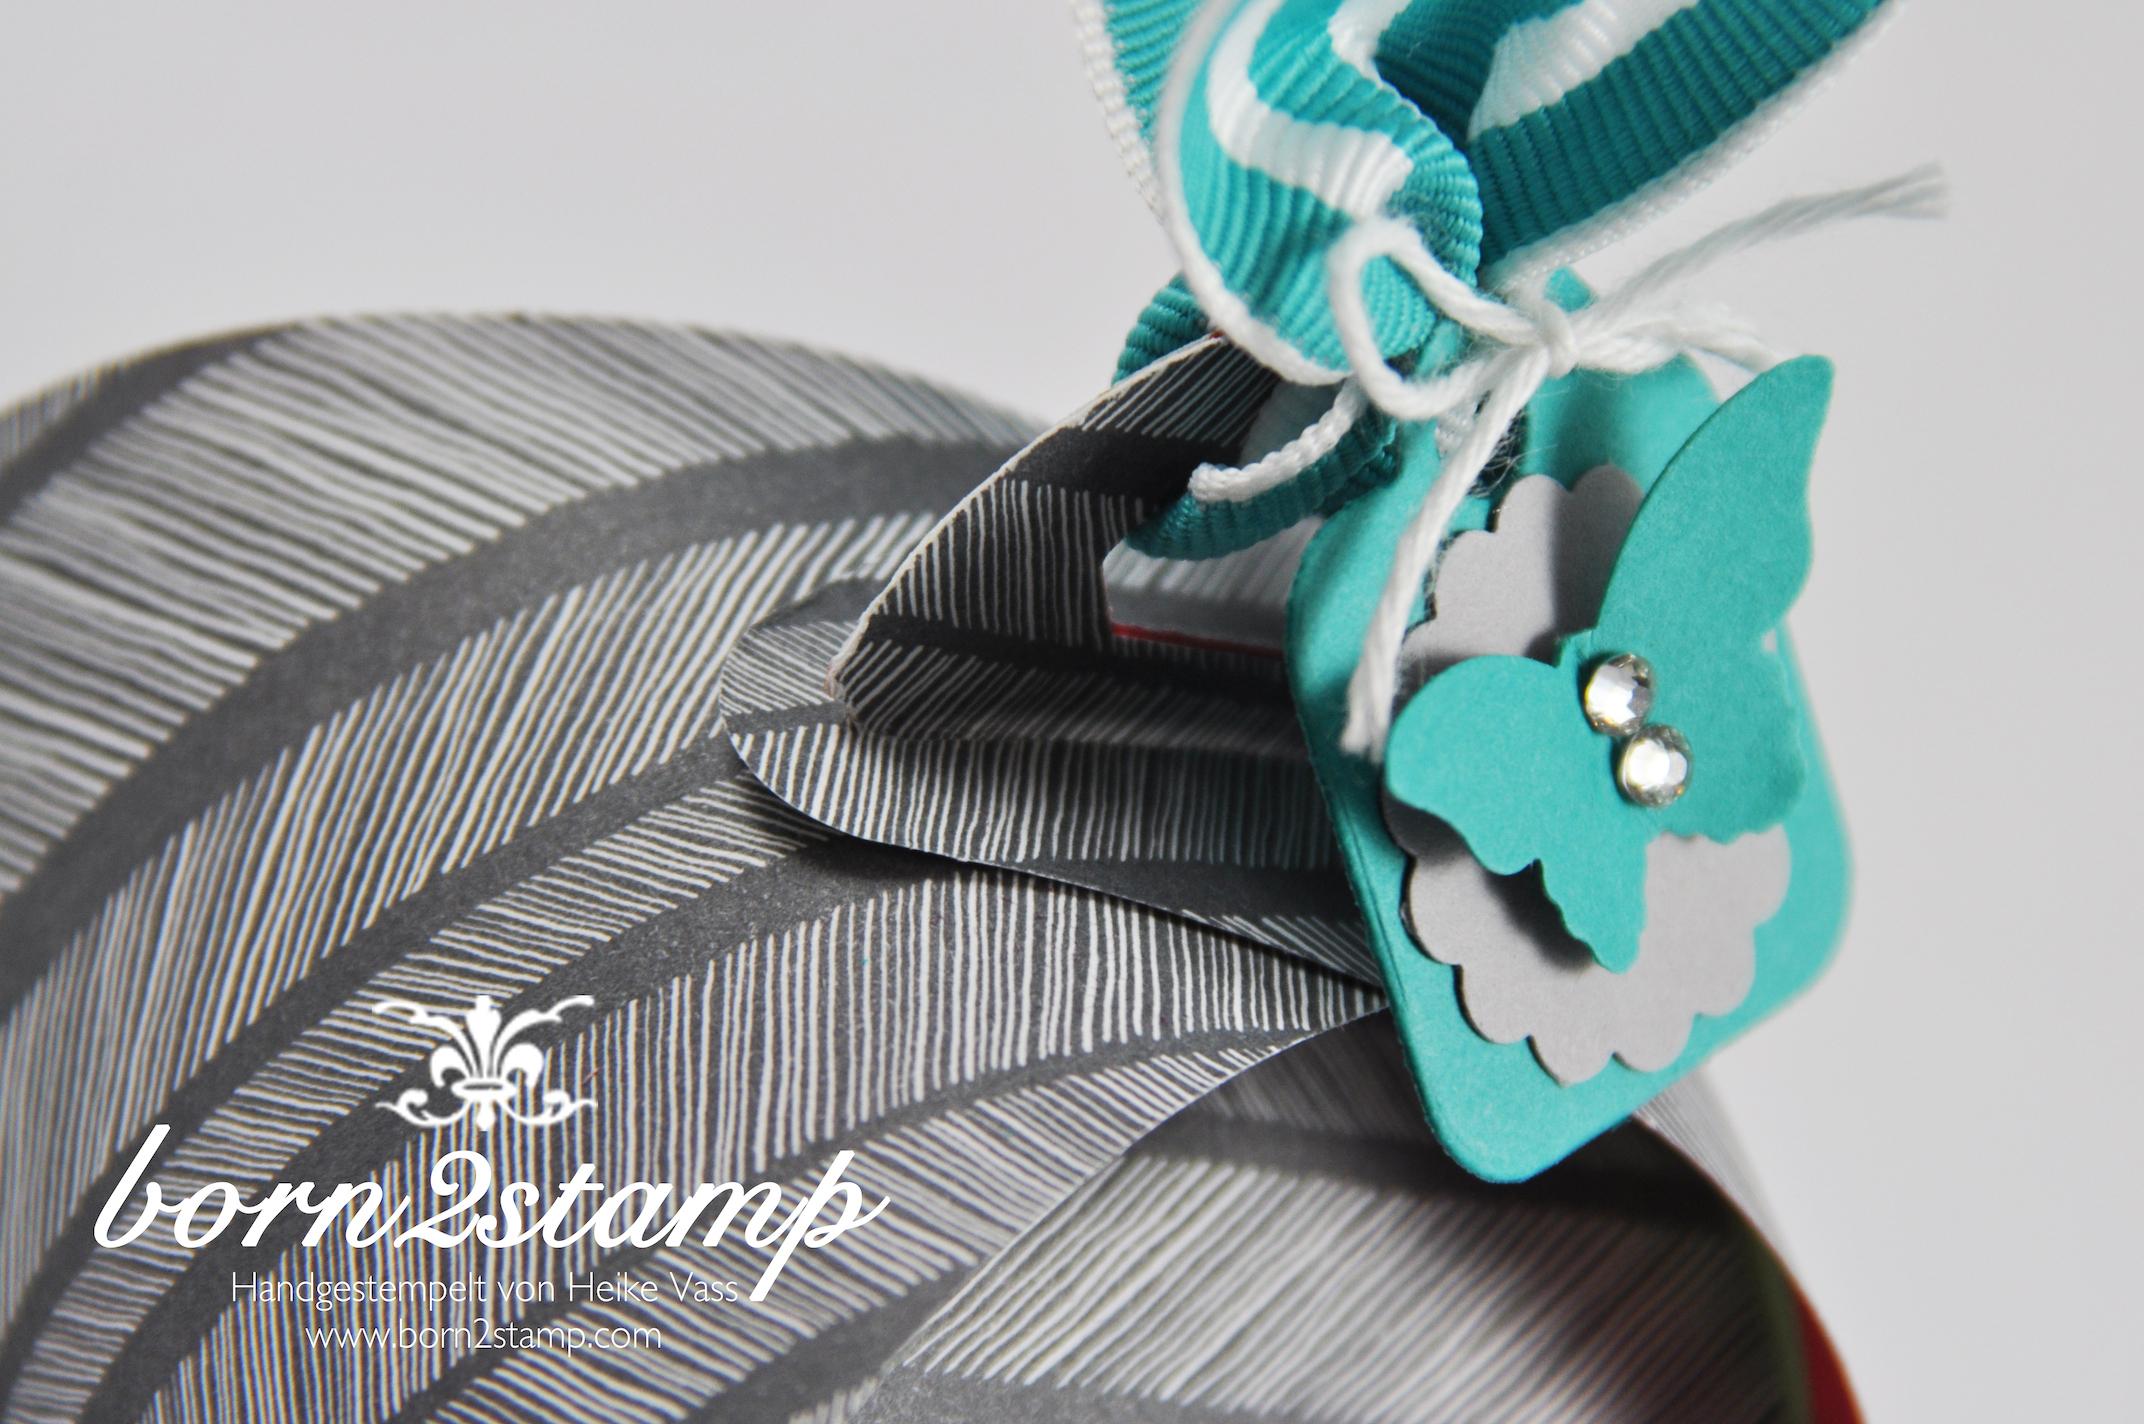 STAMPIN' UP! Verpackung Thinlits Curvy Keepsakes Box Zierschachtel Big Shot DSP Konfetti-Party Stanze Mini-Schmetterling Wellenkreis Kordel Gestreiftes geripptes Geschenkband